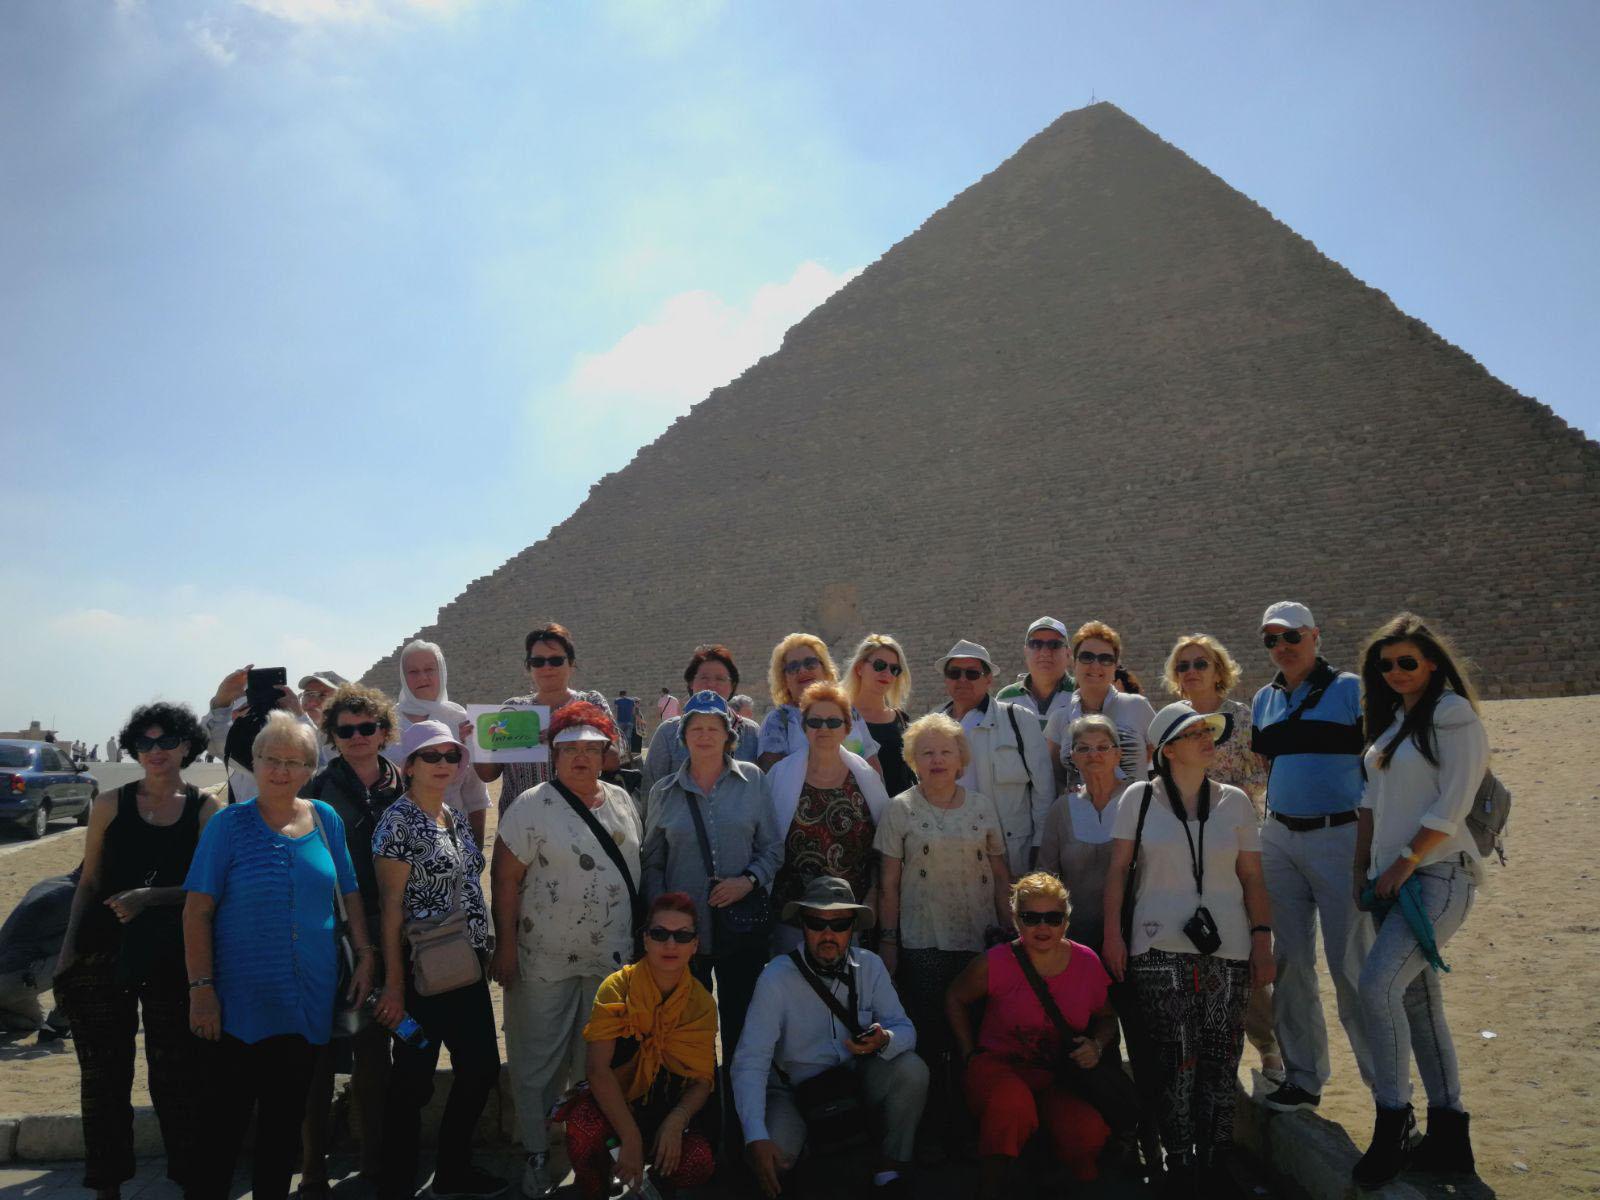 Egipt Piramida lui Keops